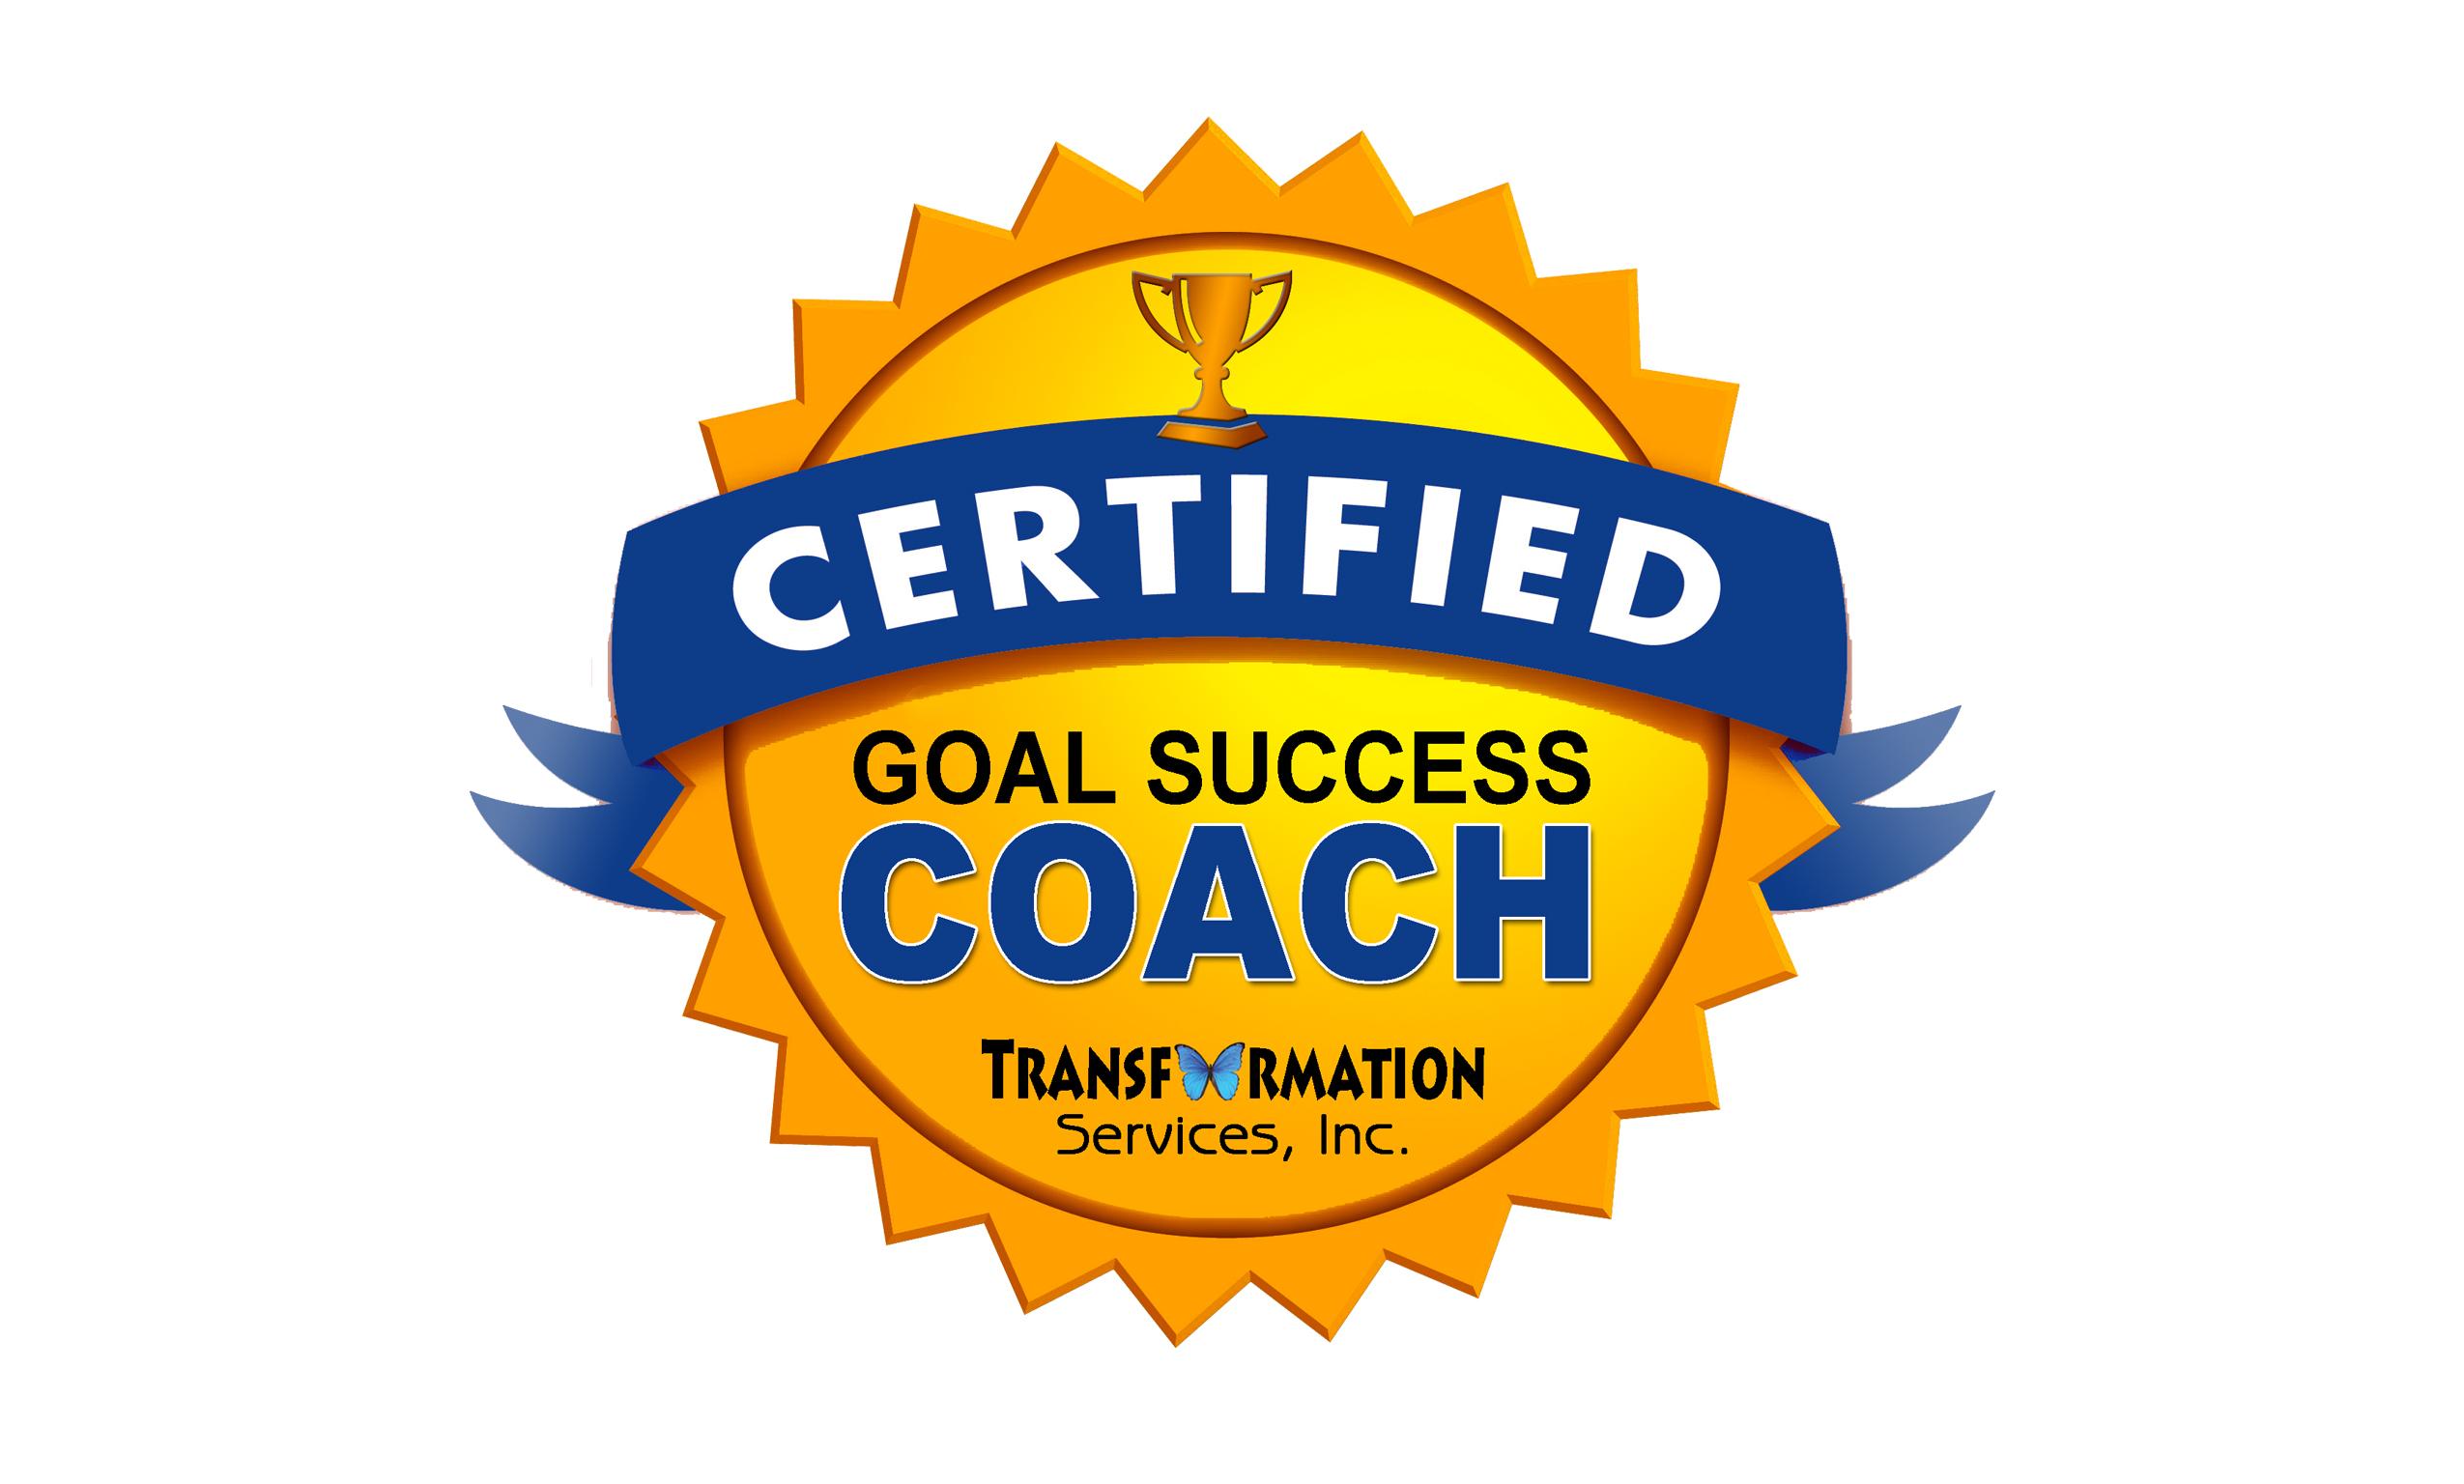 Master life coach certification and training program goal success life coach certification member xflitez Choice Image